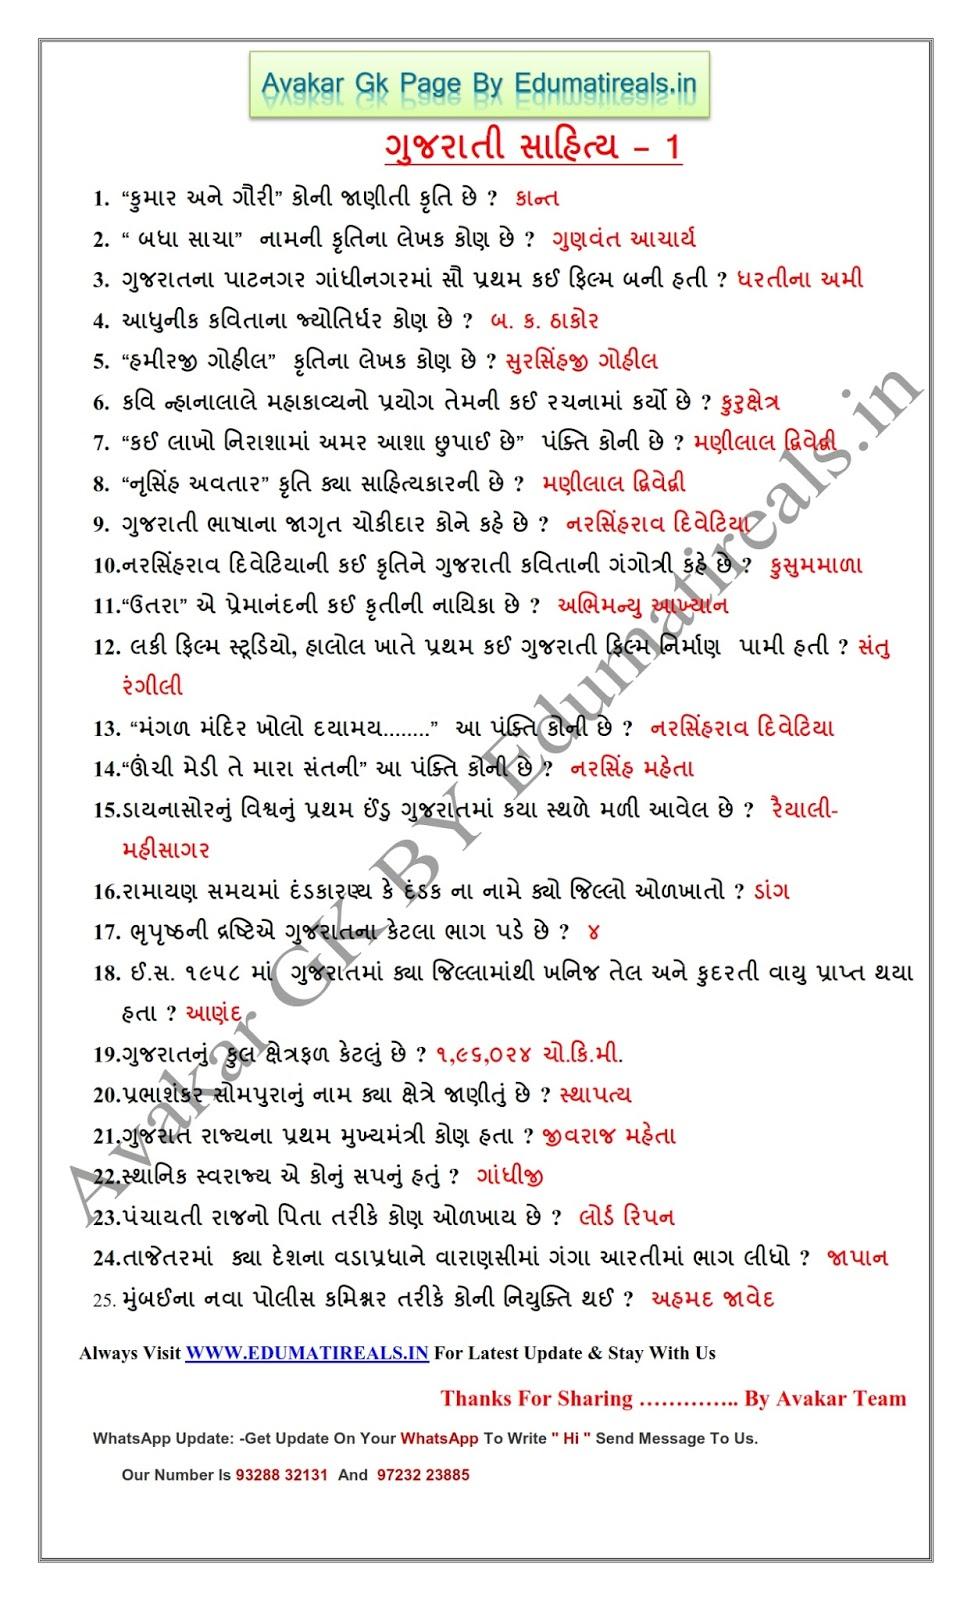 daily gk aakar gk page for your exam date 28 01 2016 gujarati sahitya